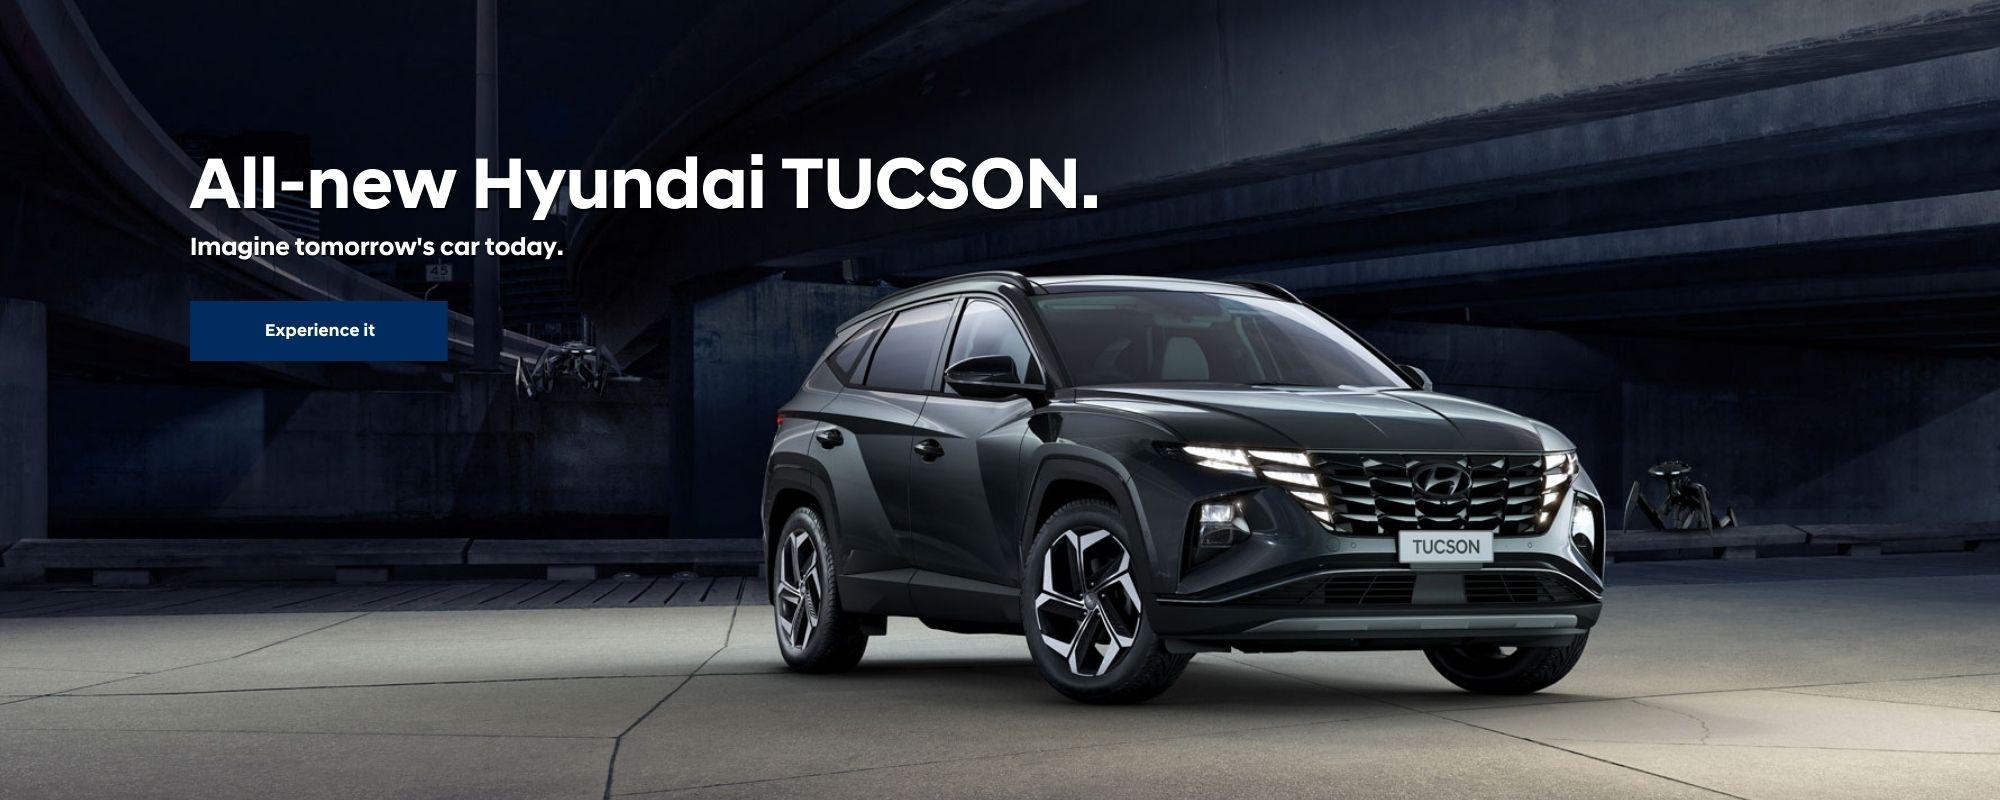 All-new Hyundai TUCSON.